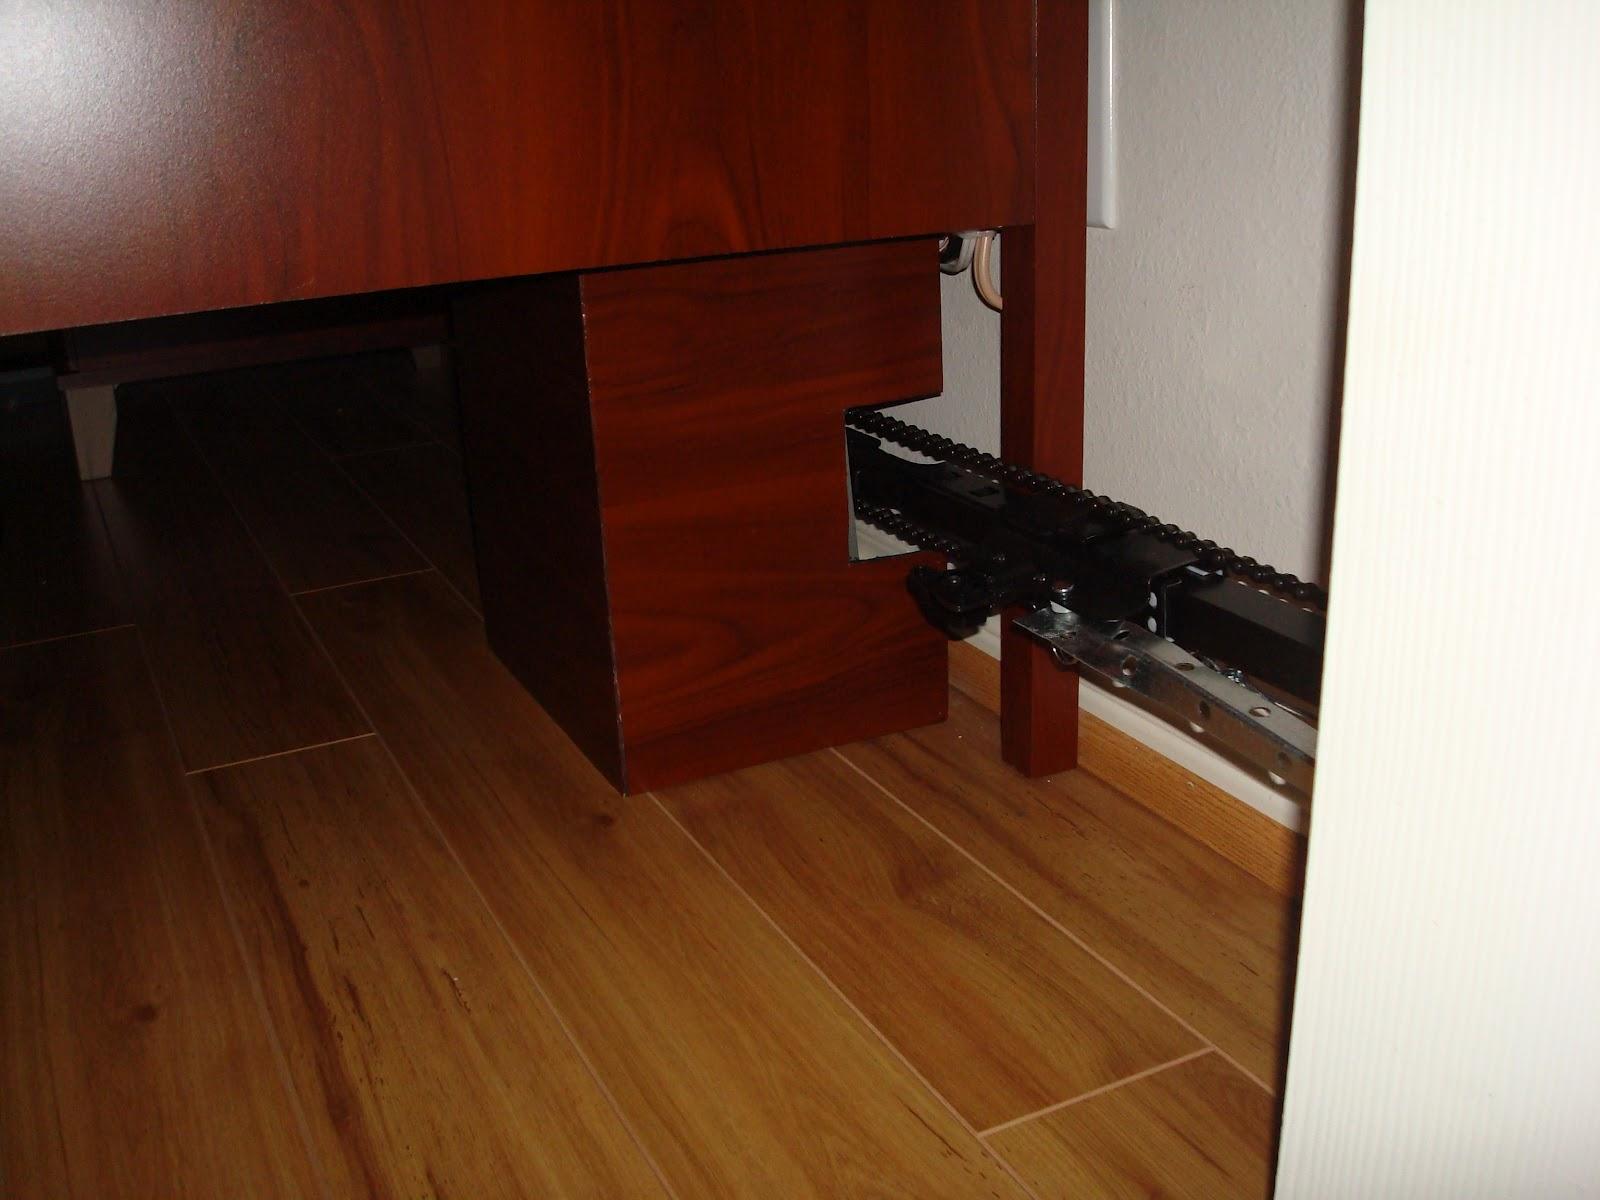 L 39 art de fermer la porte de sa chambre avec un m canisme d - L encadrure de la porte ...